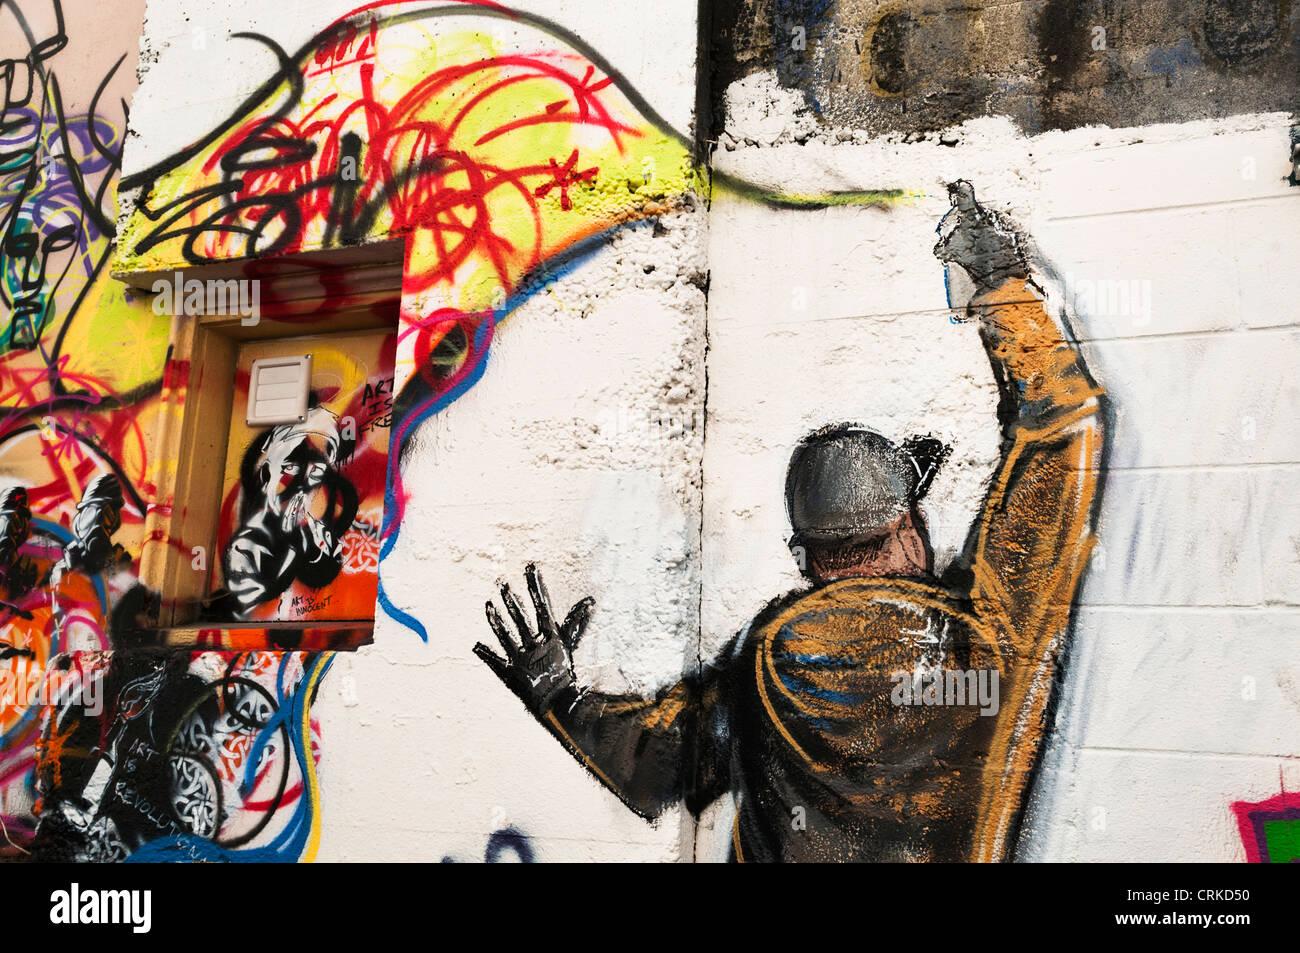 Graffiti wall painting - Graffiti Of Graffiti Artist Spray Painting A Wall In An Alley In Downtown Aberdeen Washington